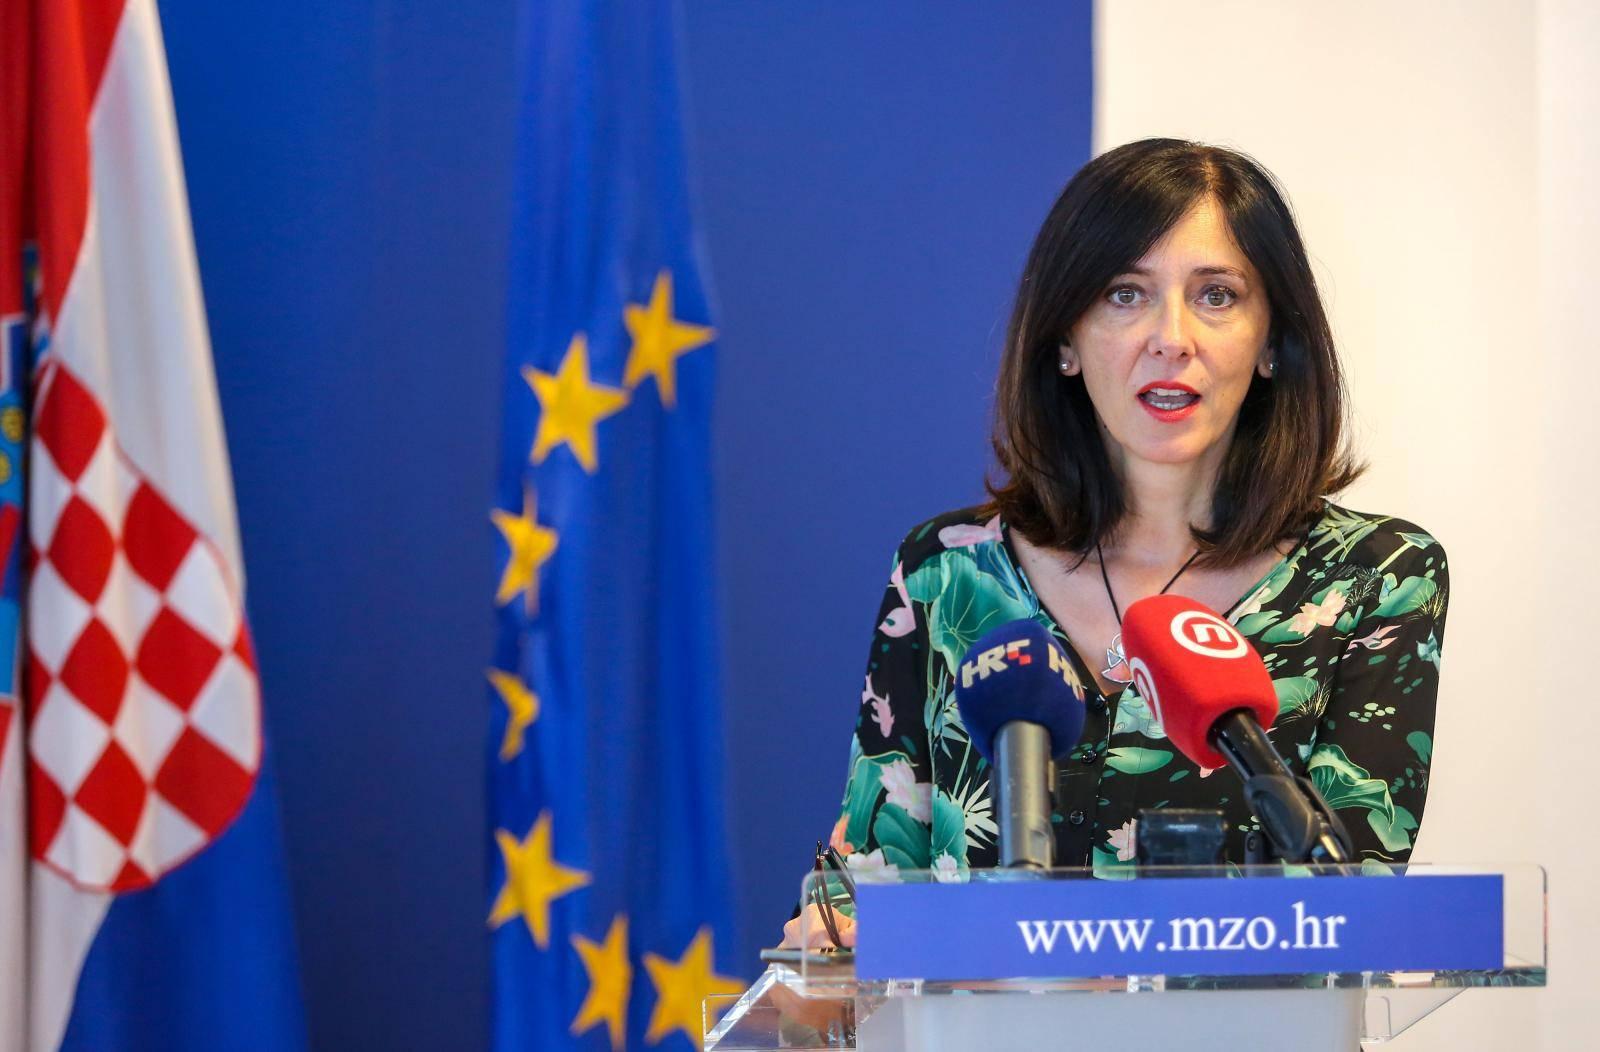 Zagreb: Ministrica Divjak predstavila proširenje aplikacije ŠeR - Školski e-Rudnik